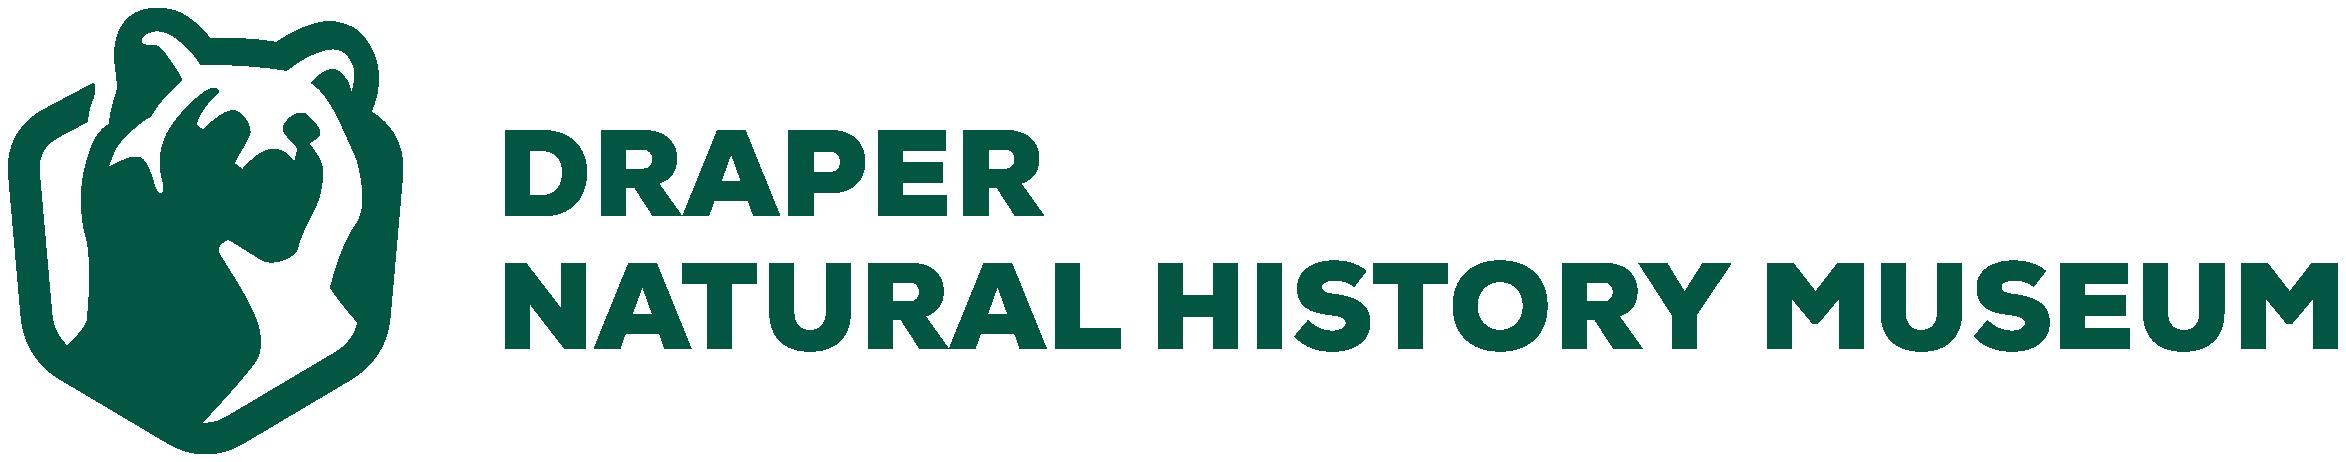 Draper logo.png